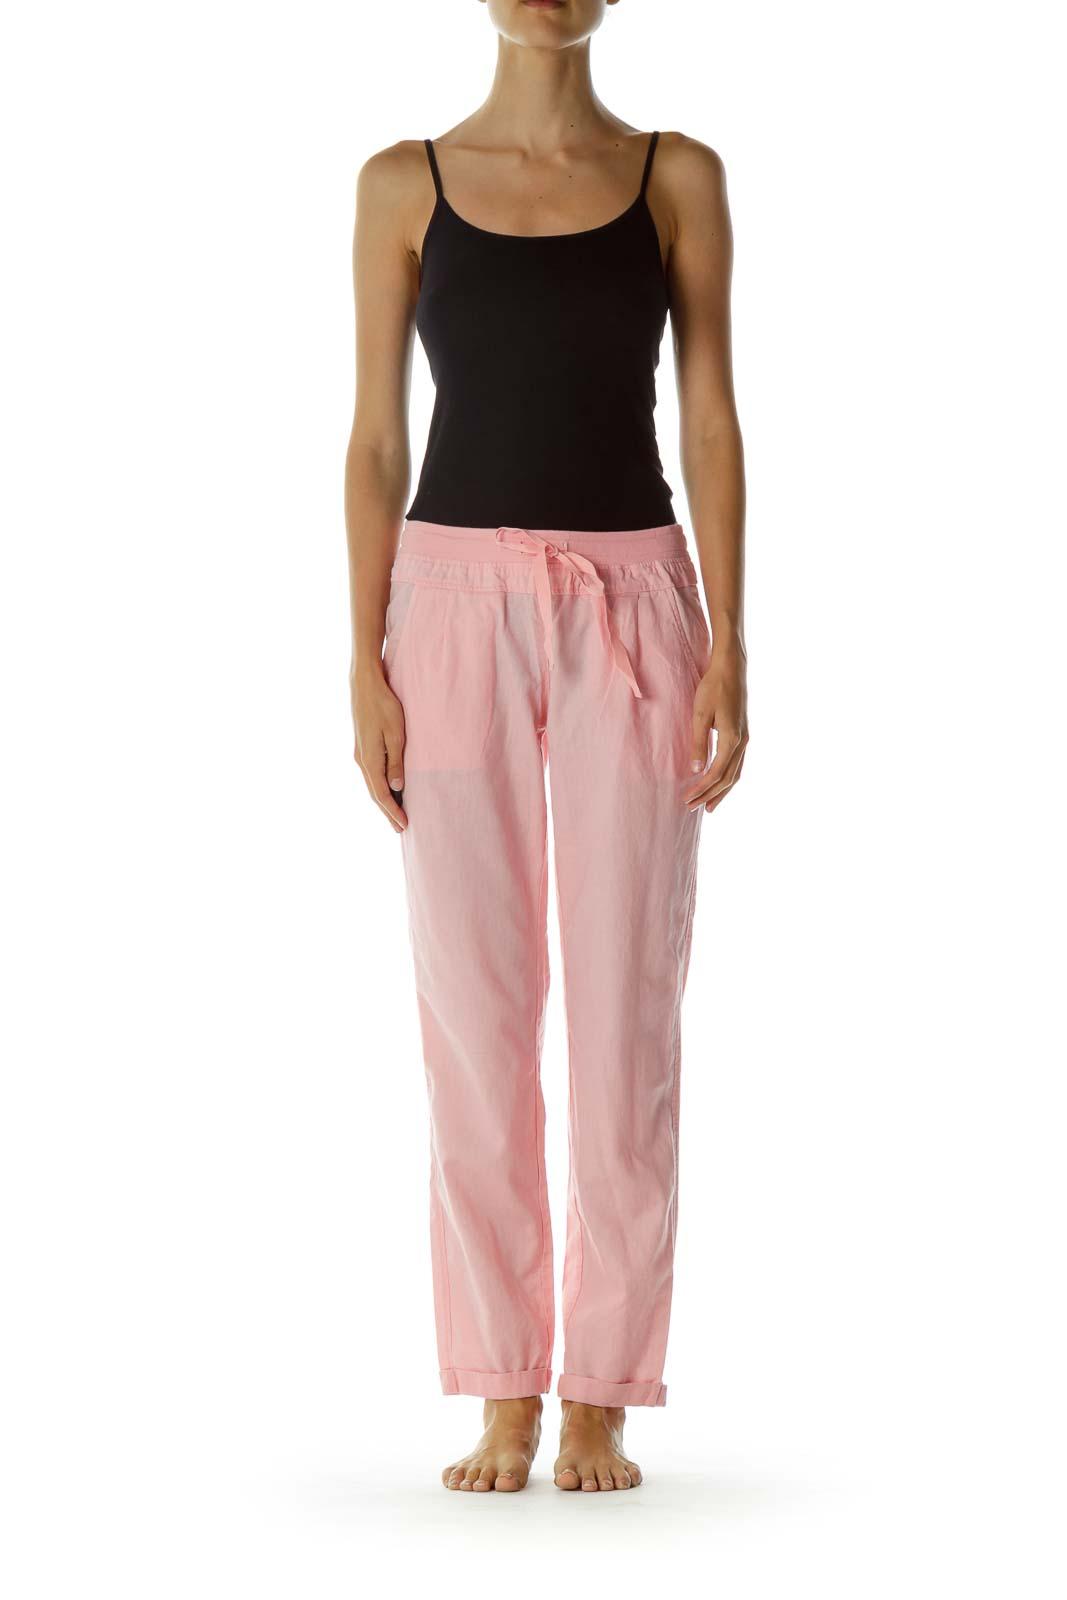 Pink Pocketed Drawstring Capri pants